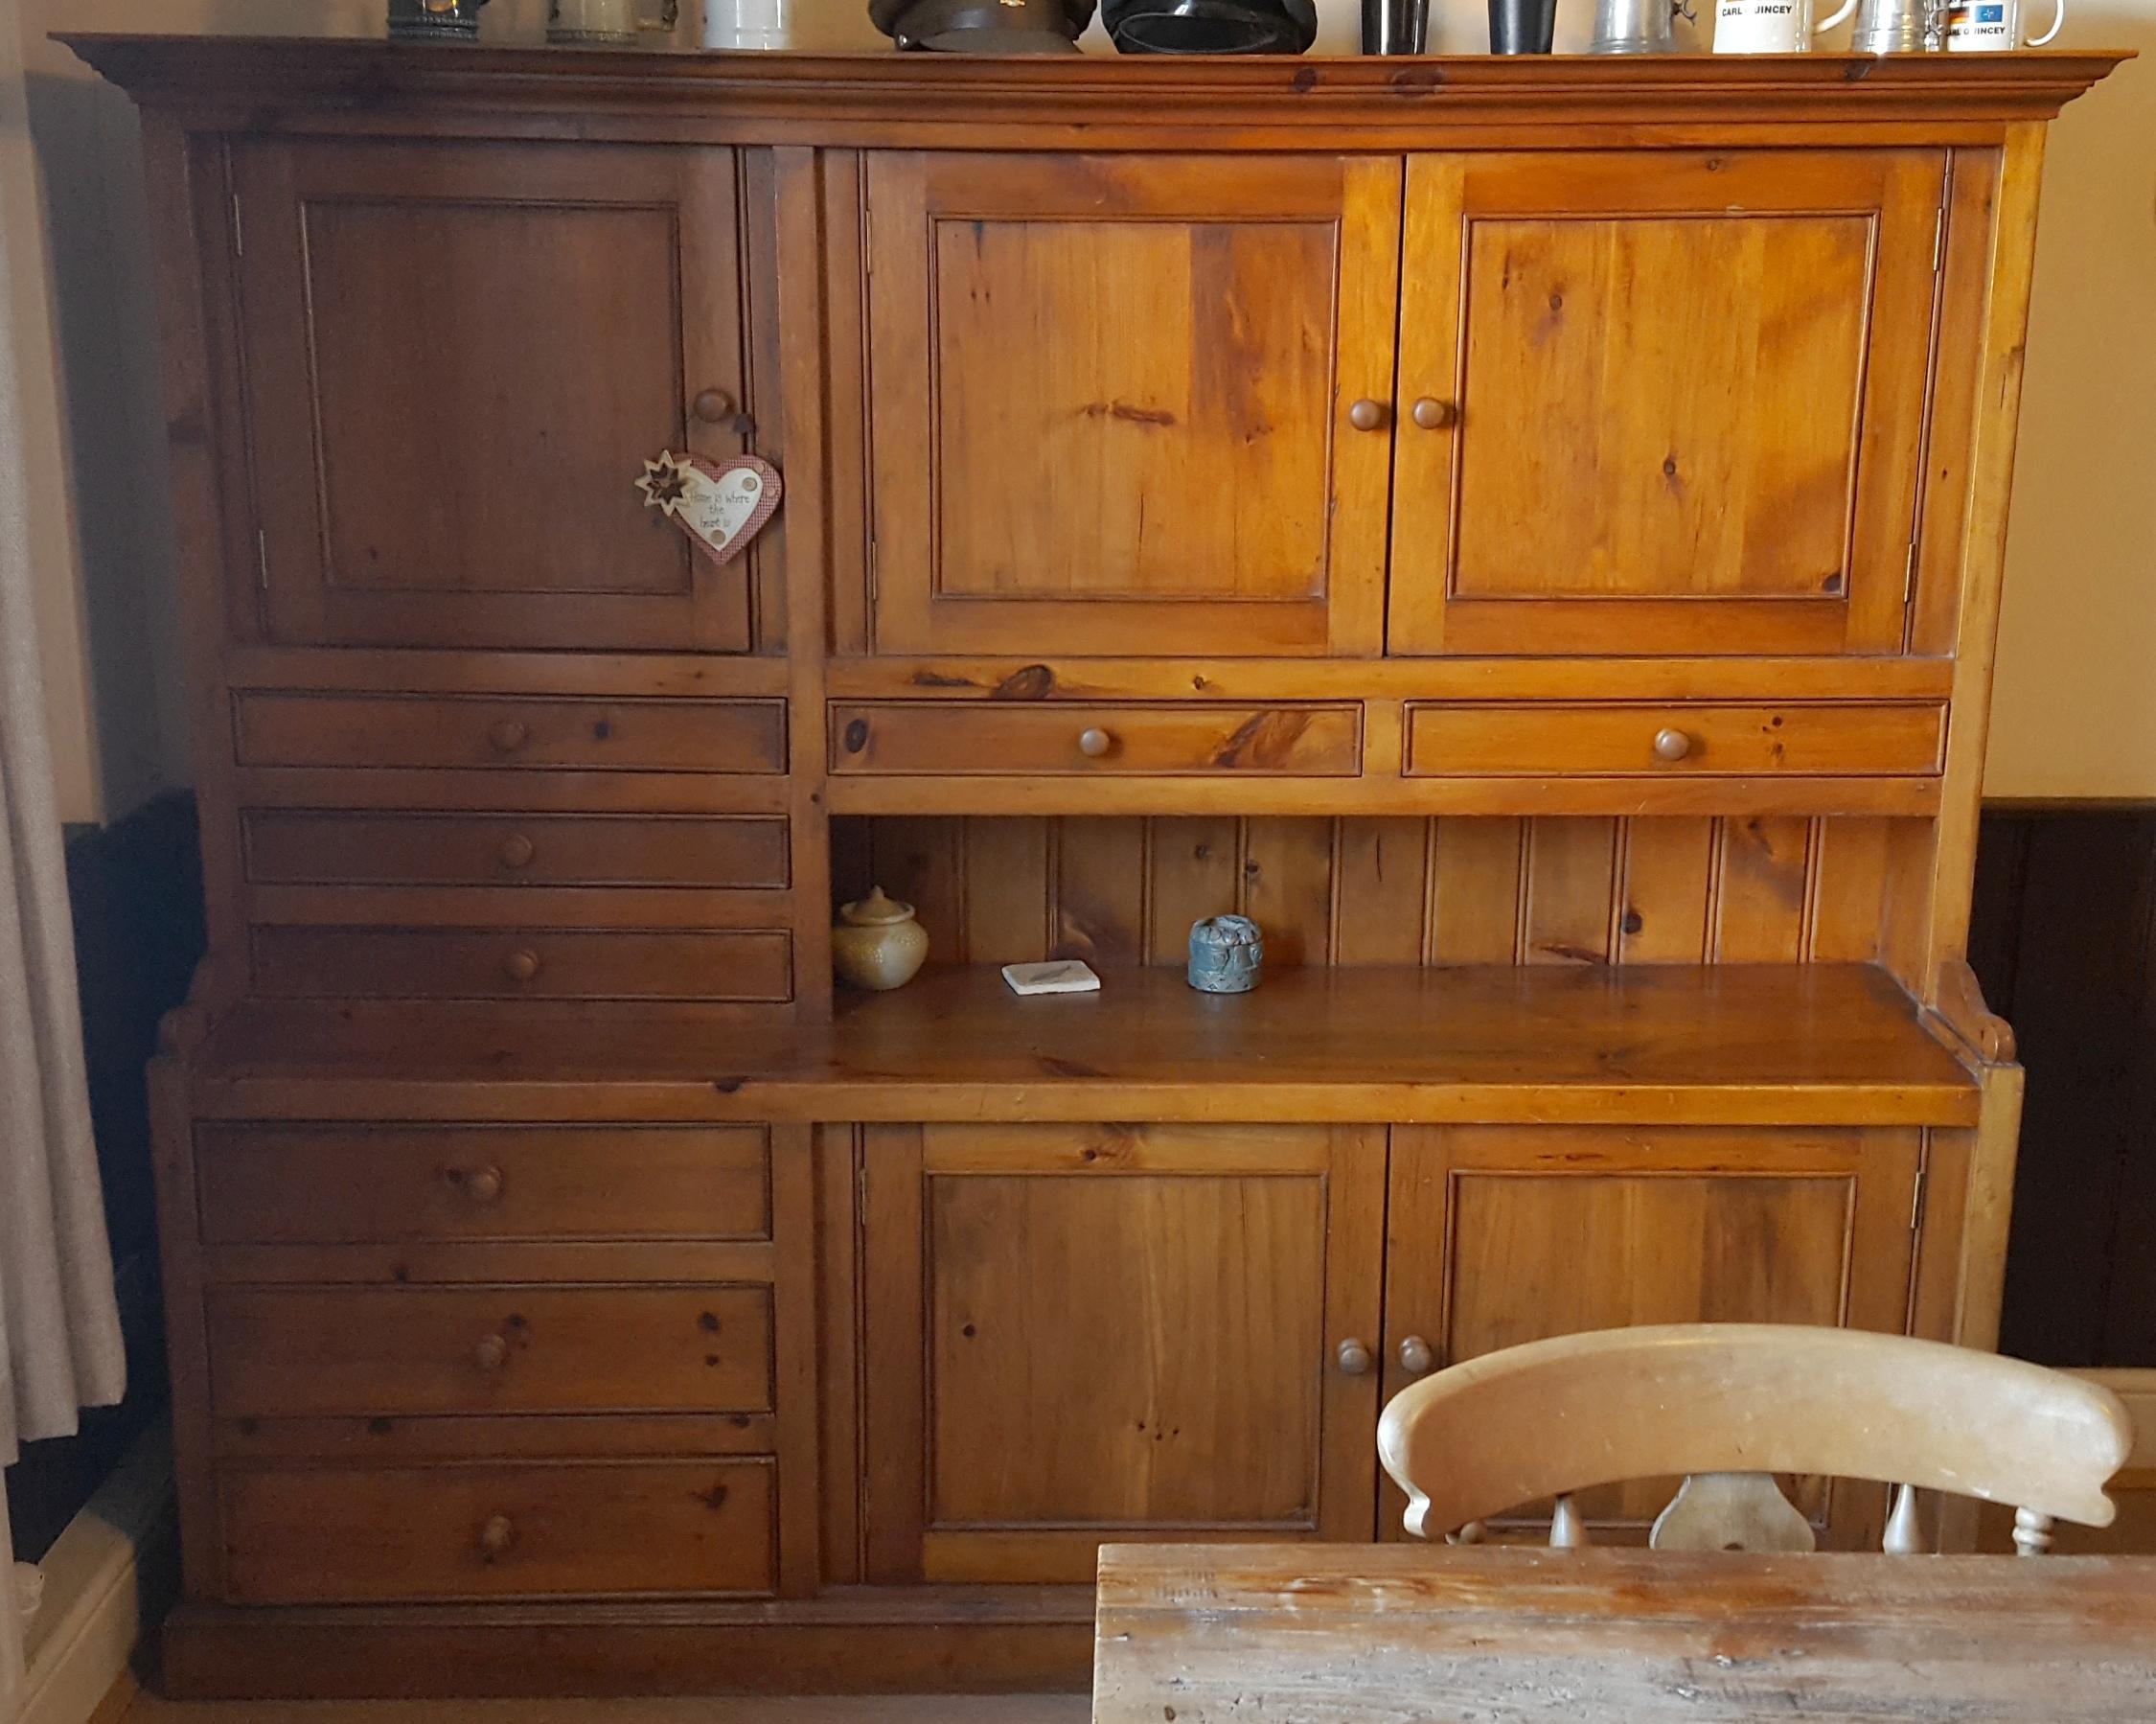 Lot 24 - Vintage Handmade Bespoke Pine Farmhouse Dresser